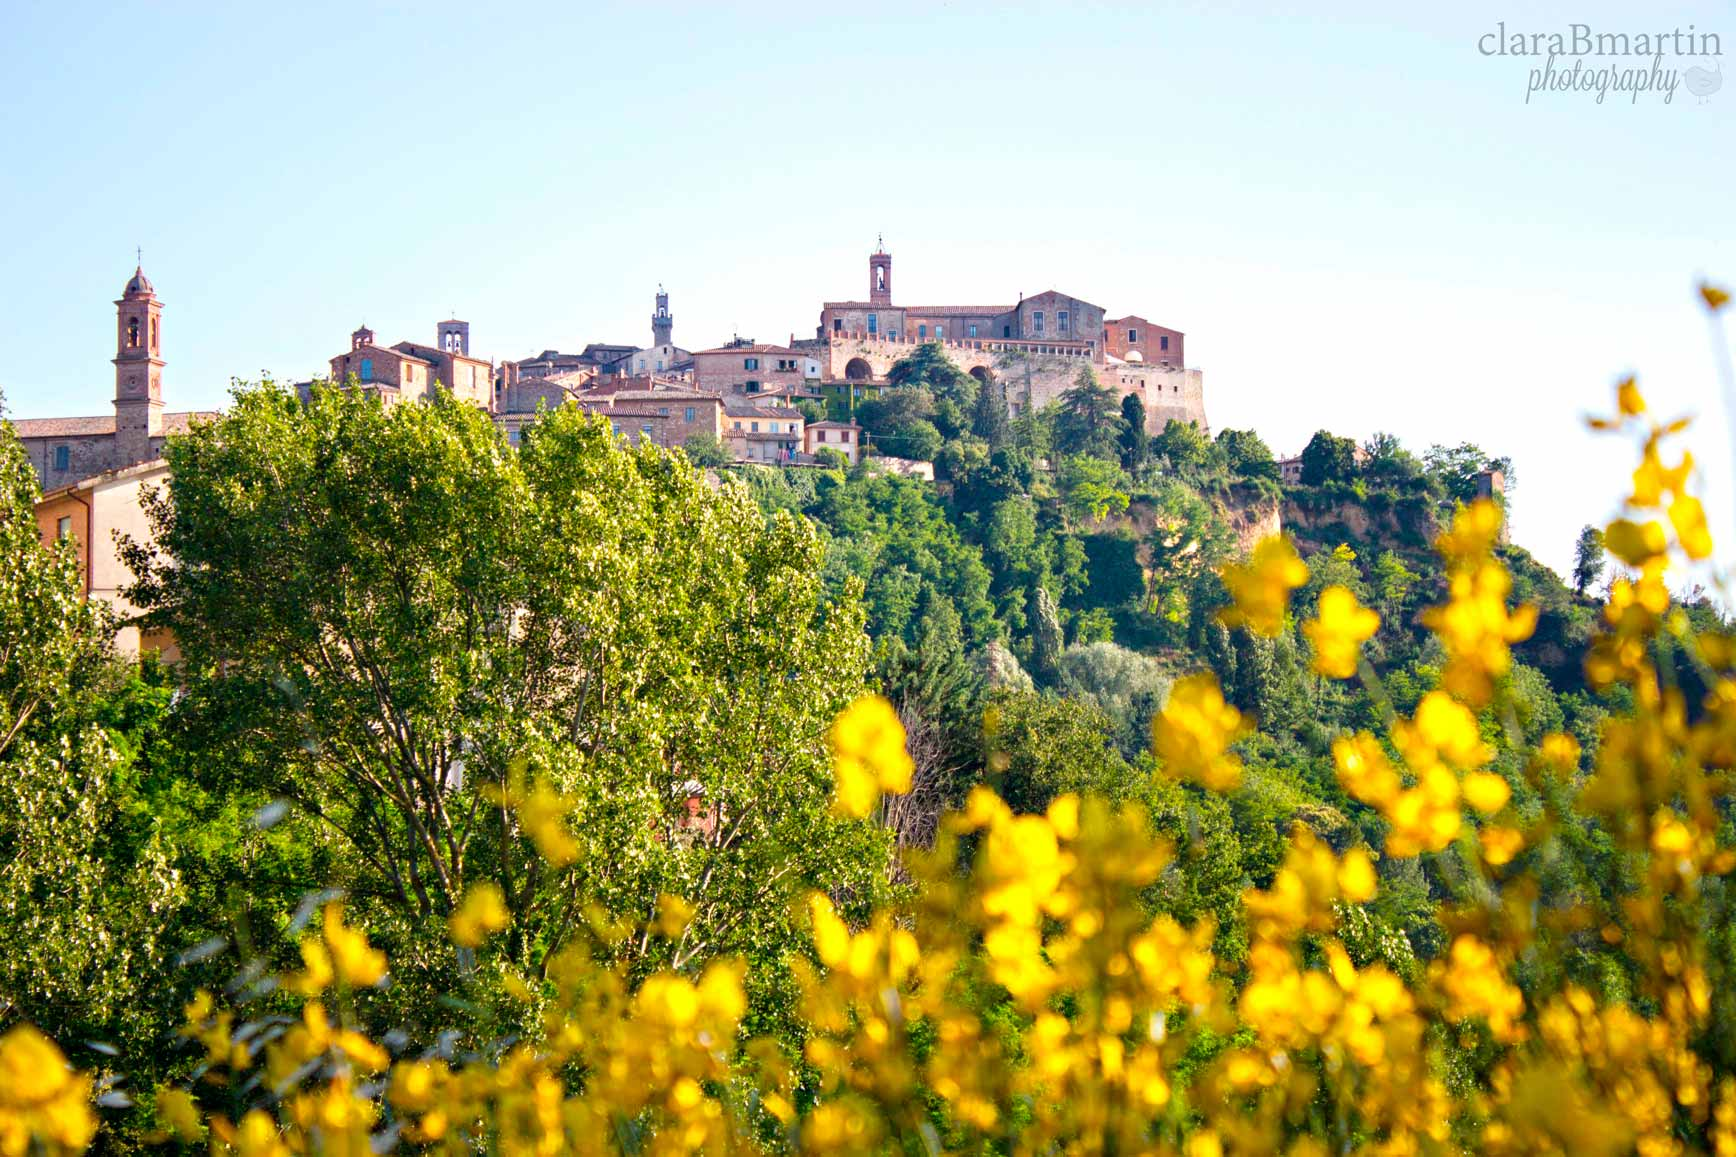 Toscana_claraBmartin02